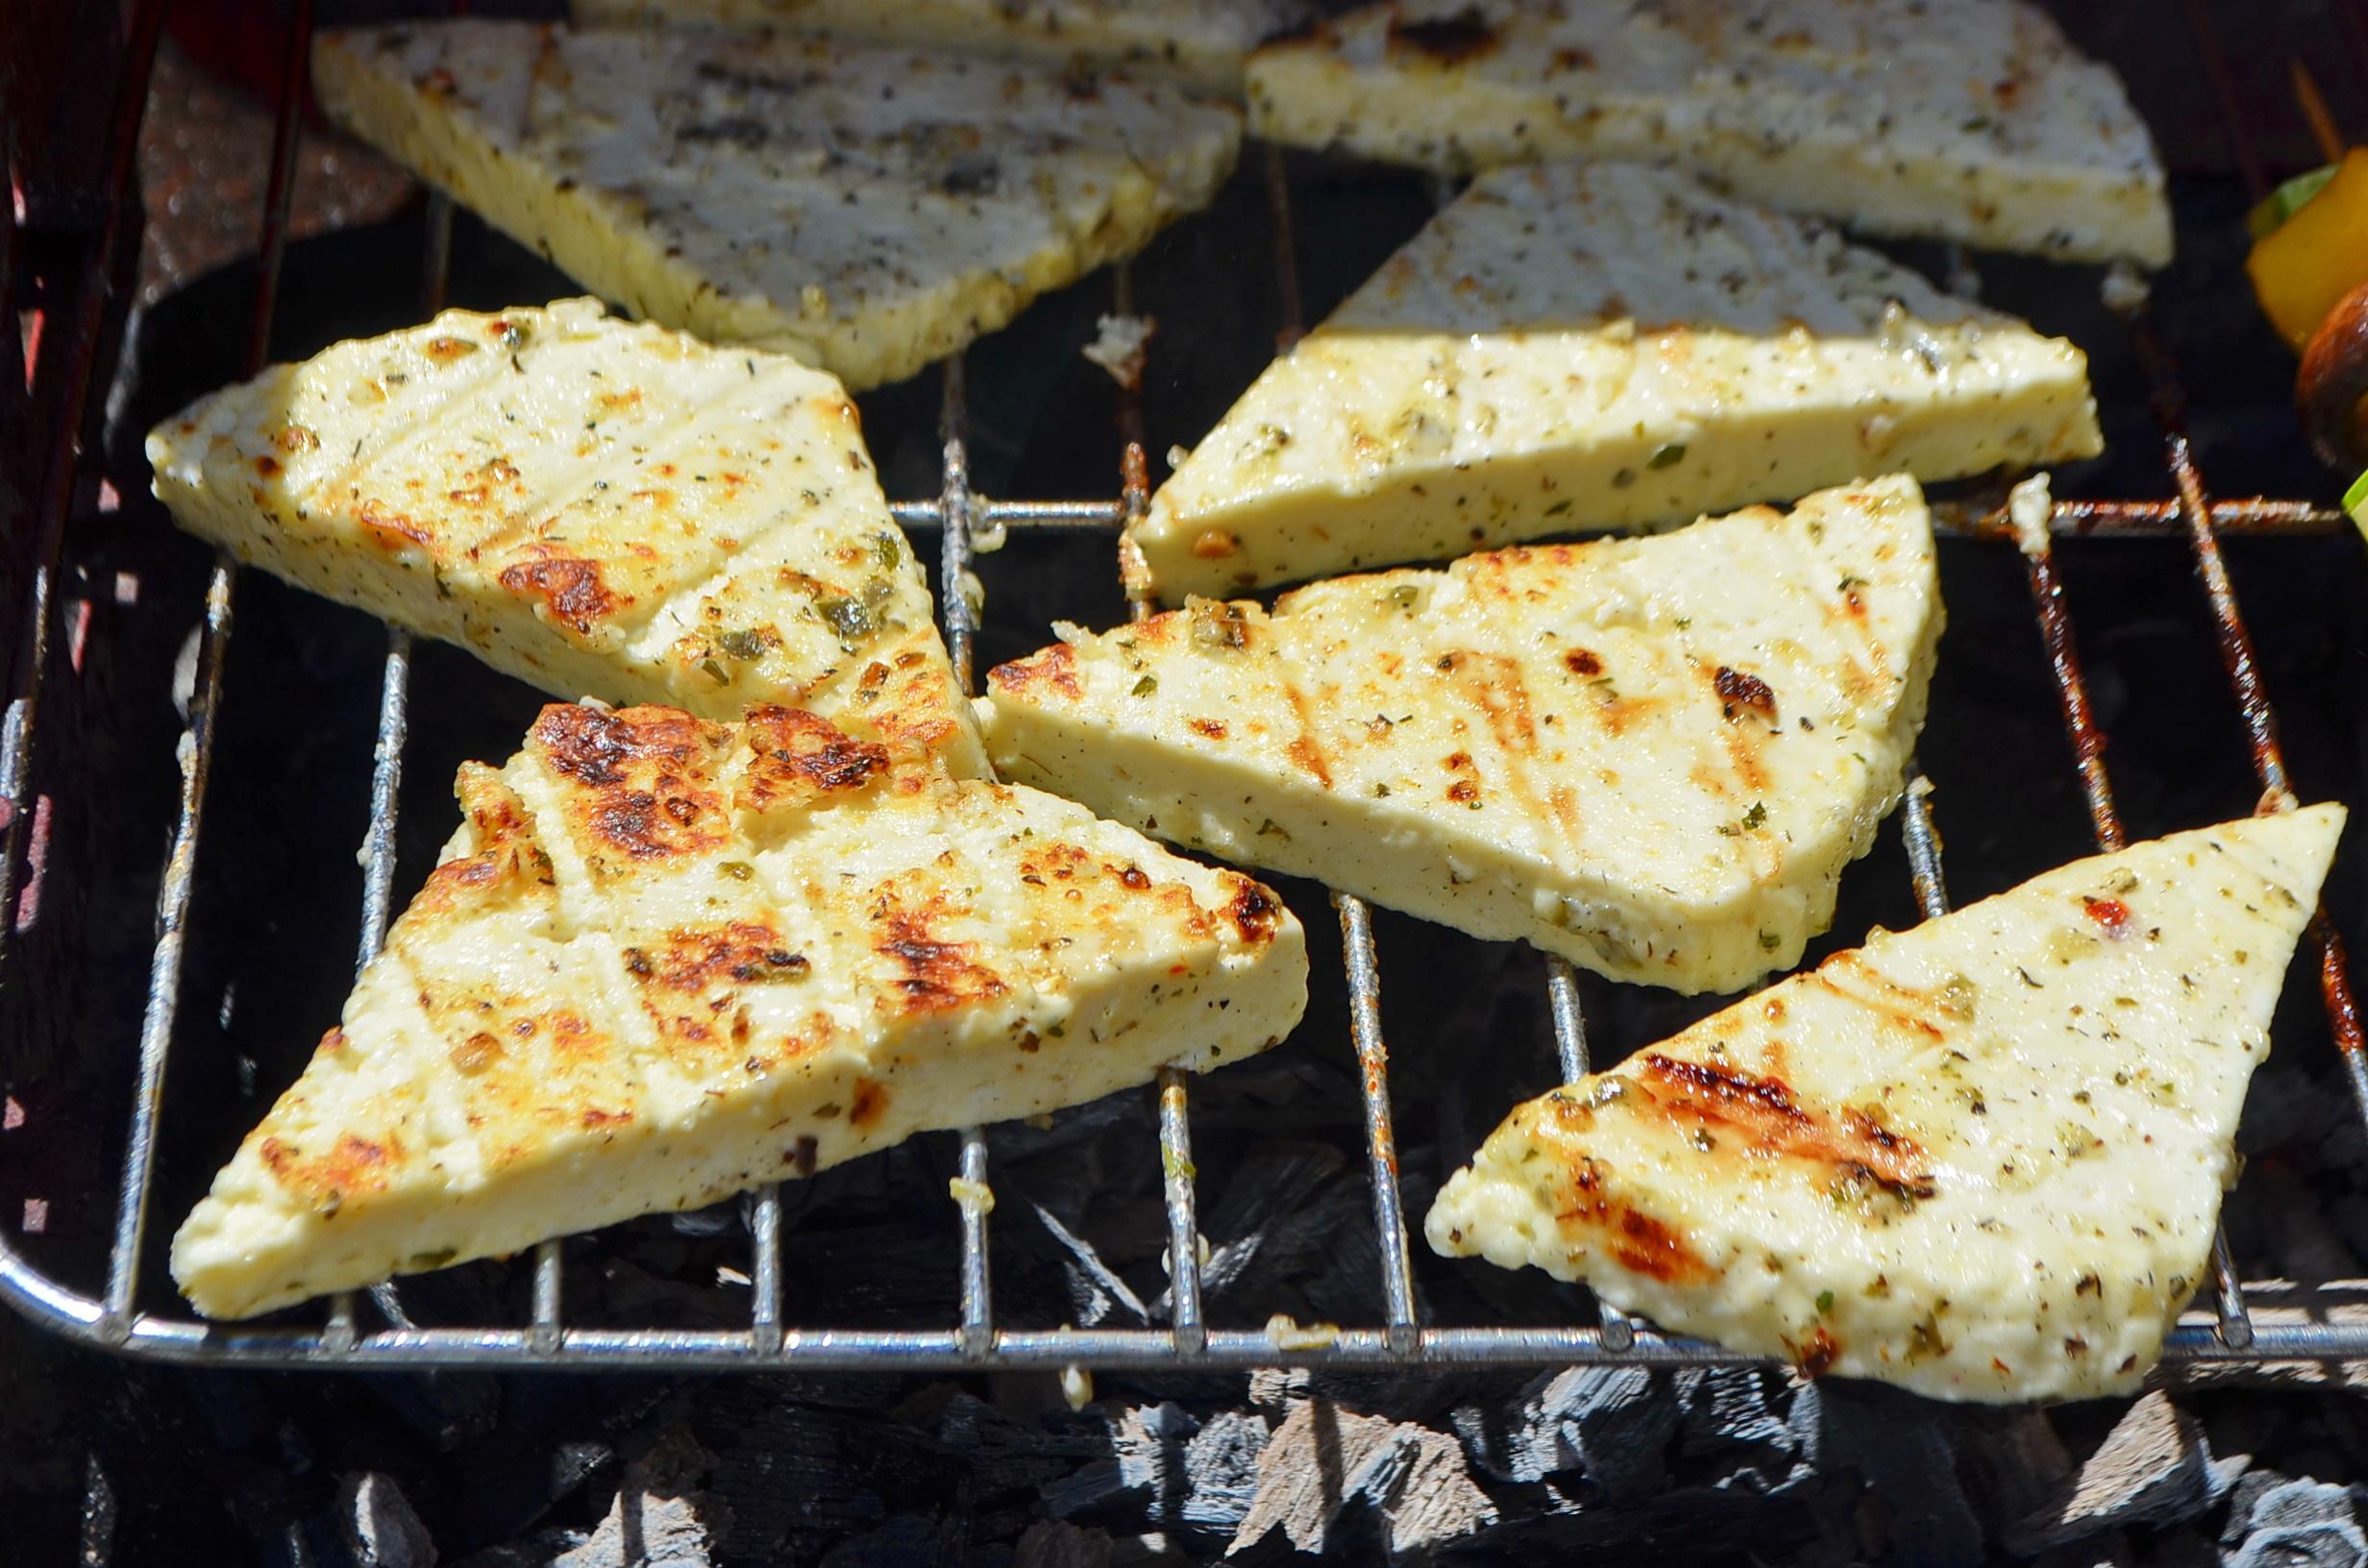 Сыр на мангале, шаг 4: сыр готов!